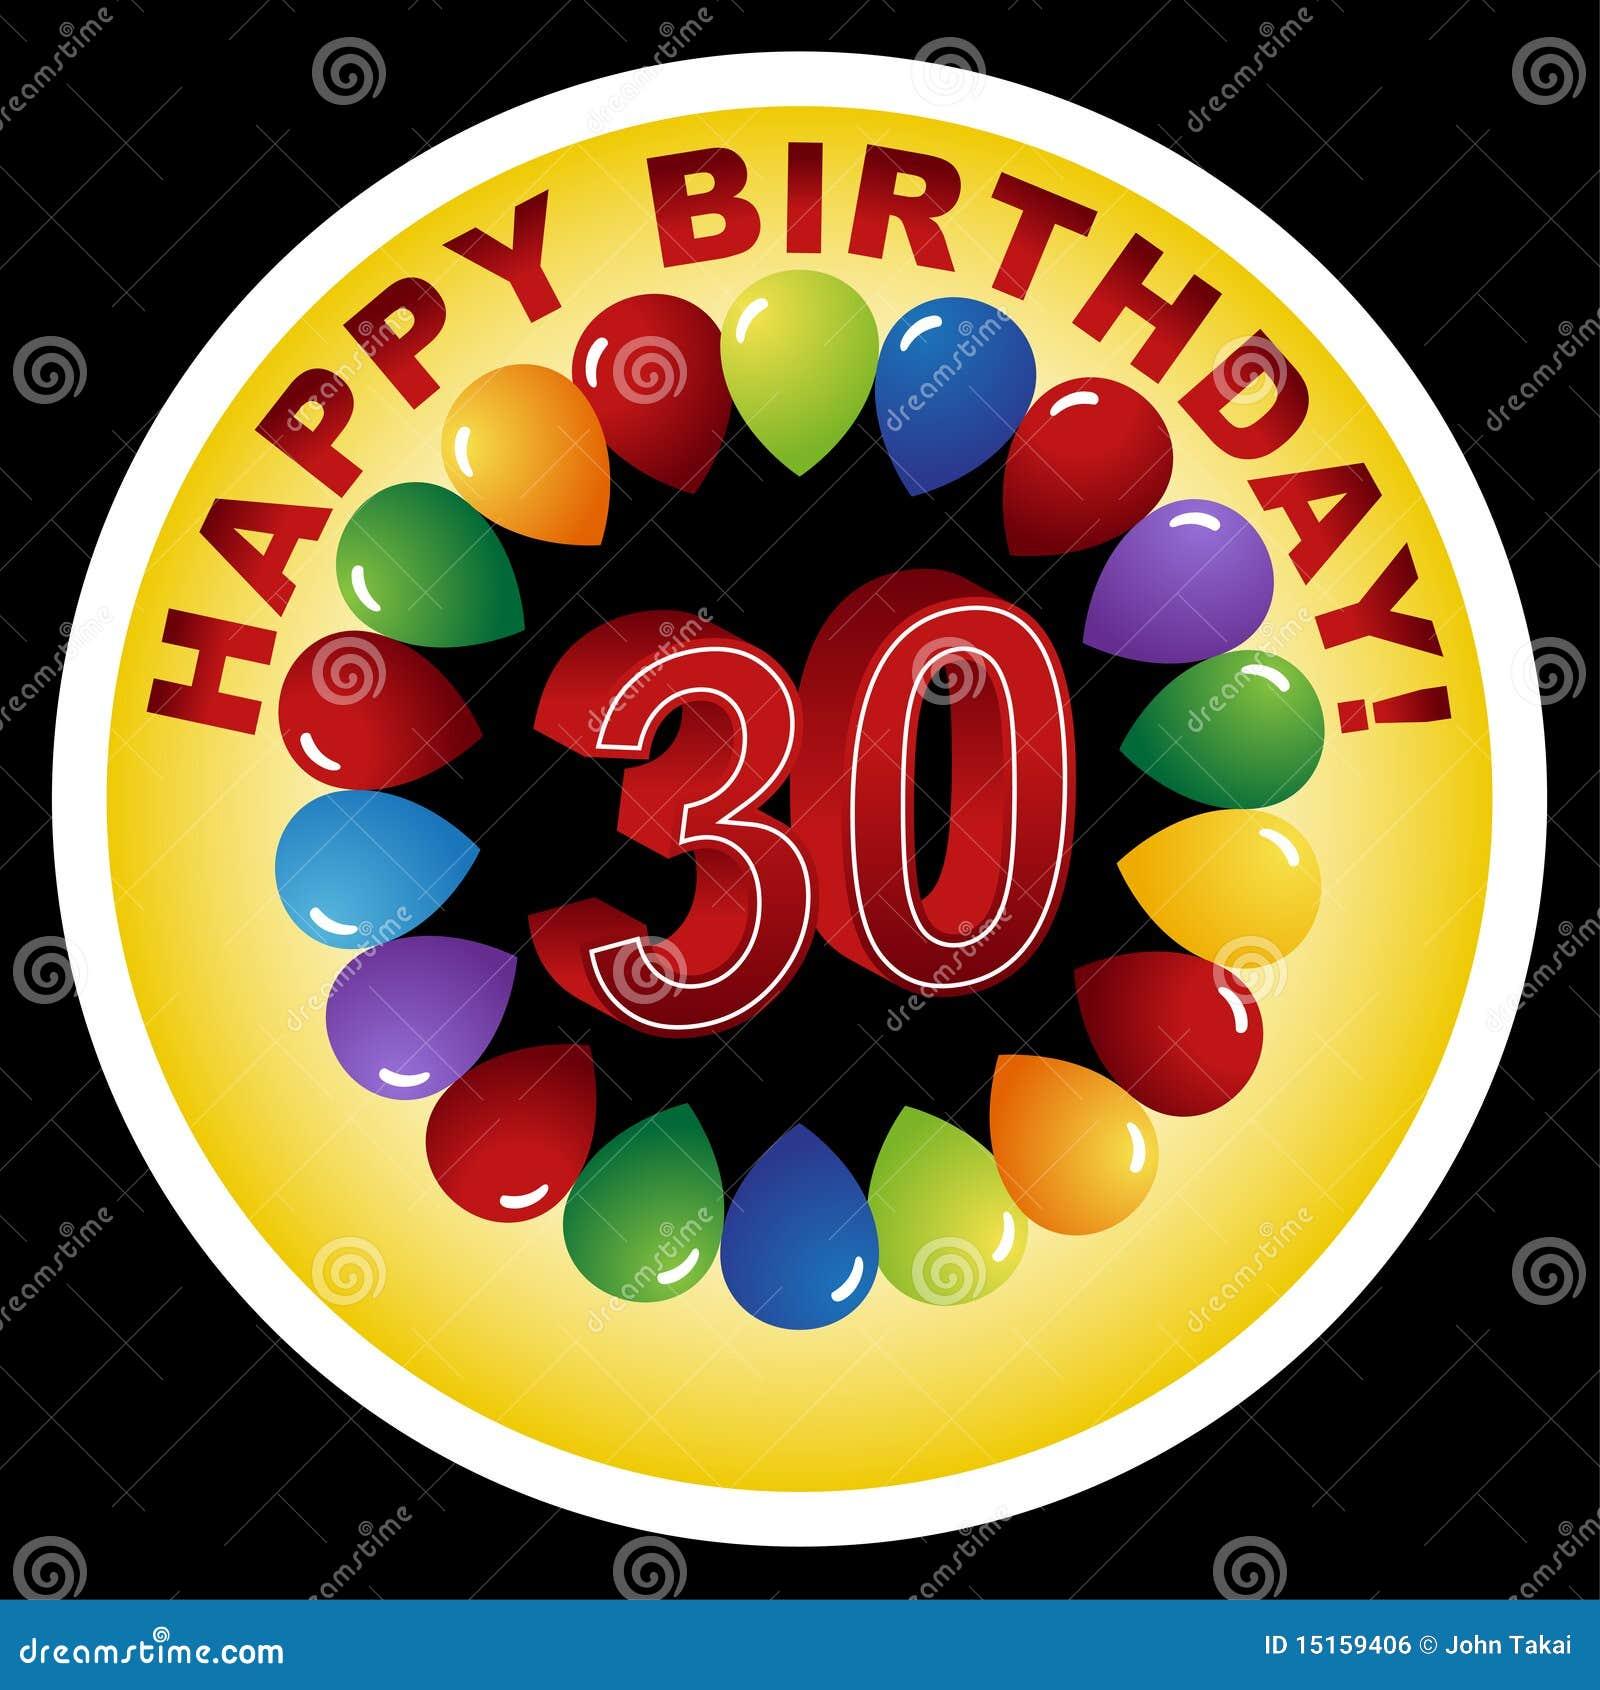 Happy 30th Birthday! Royalty Free Stock Image